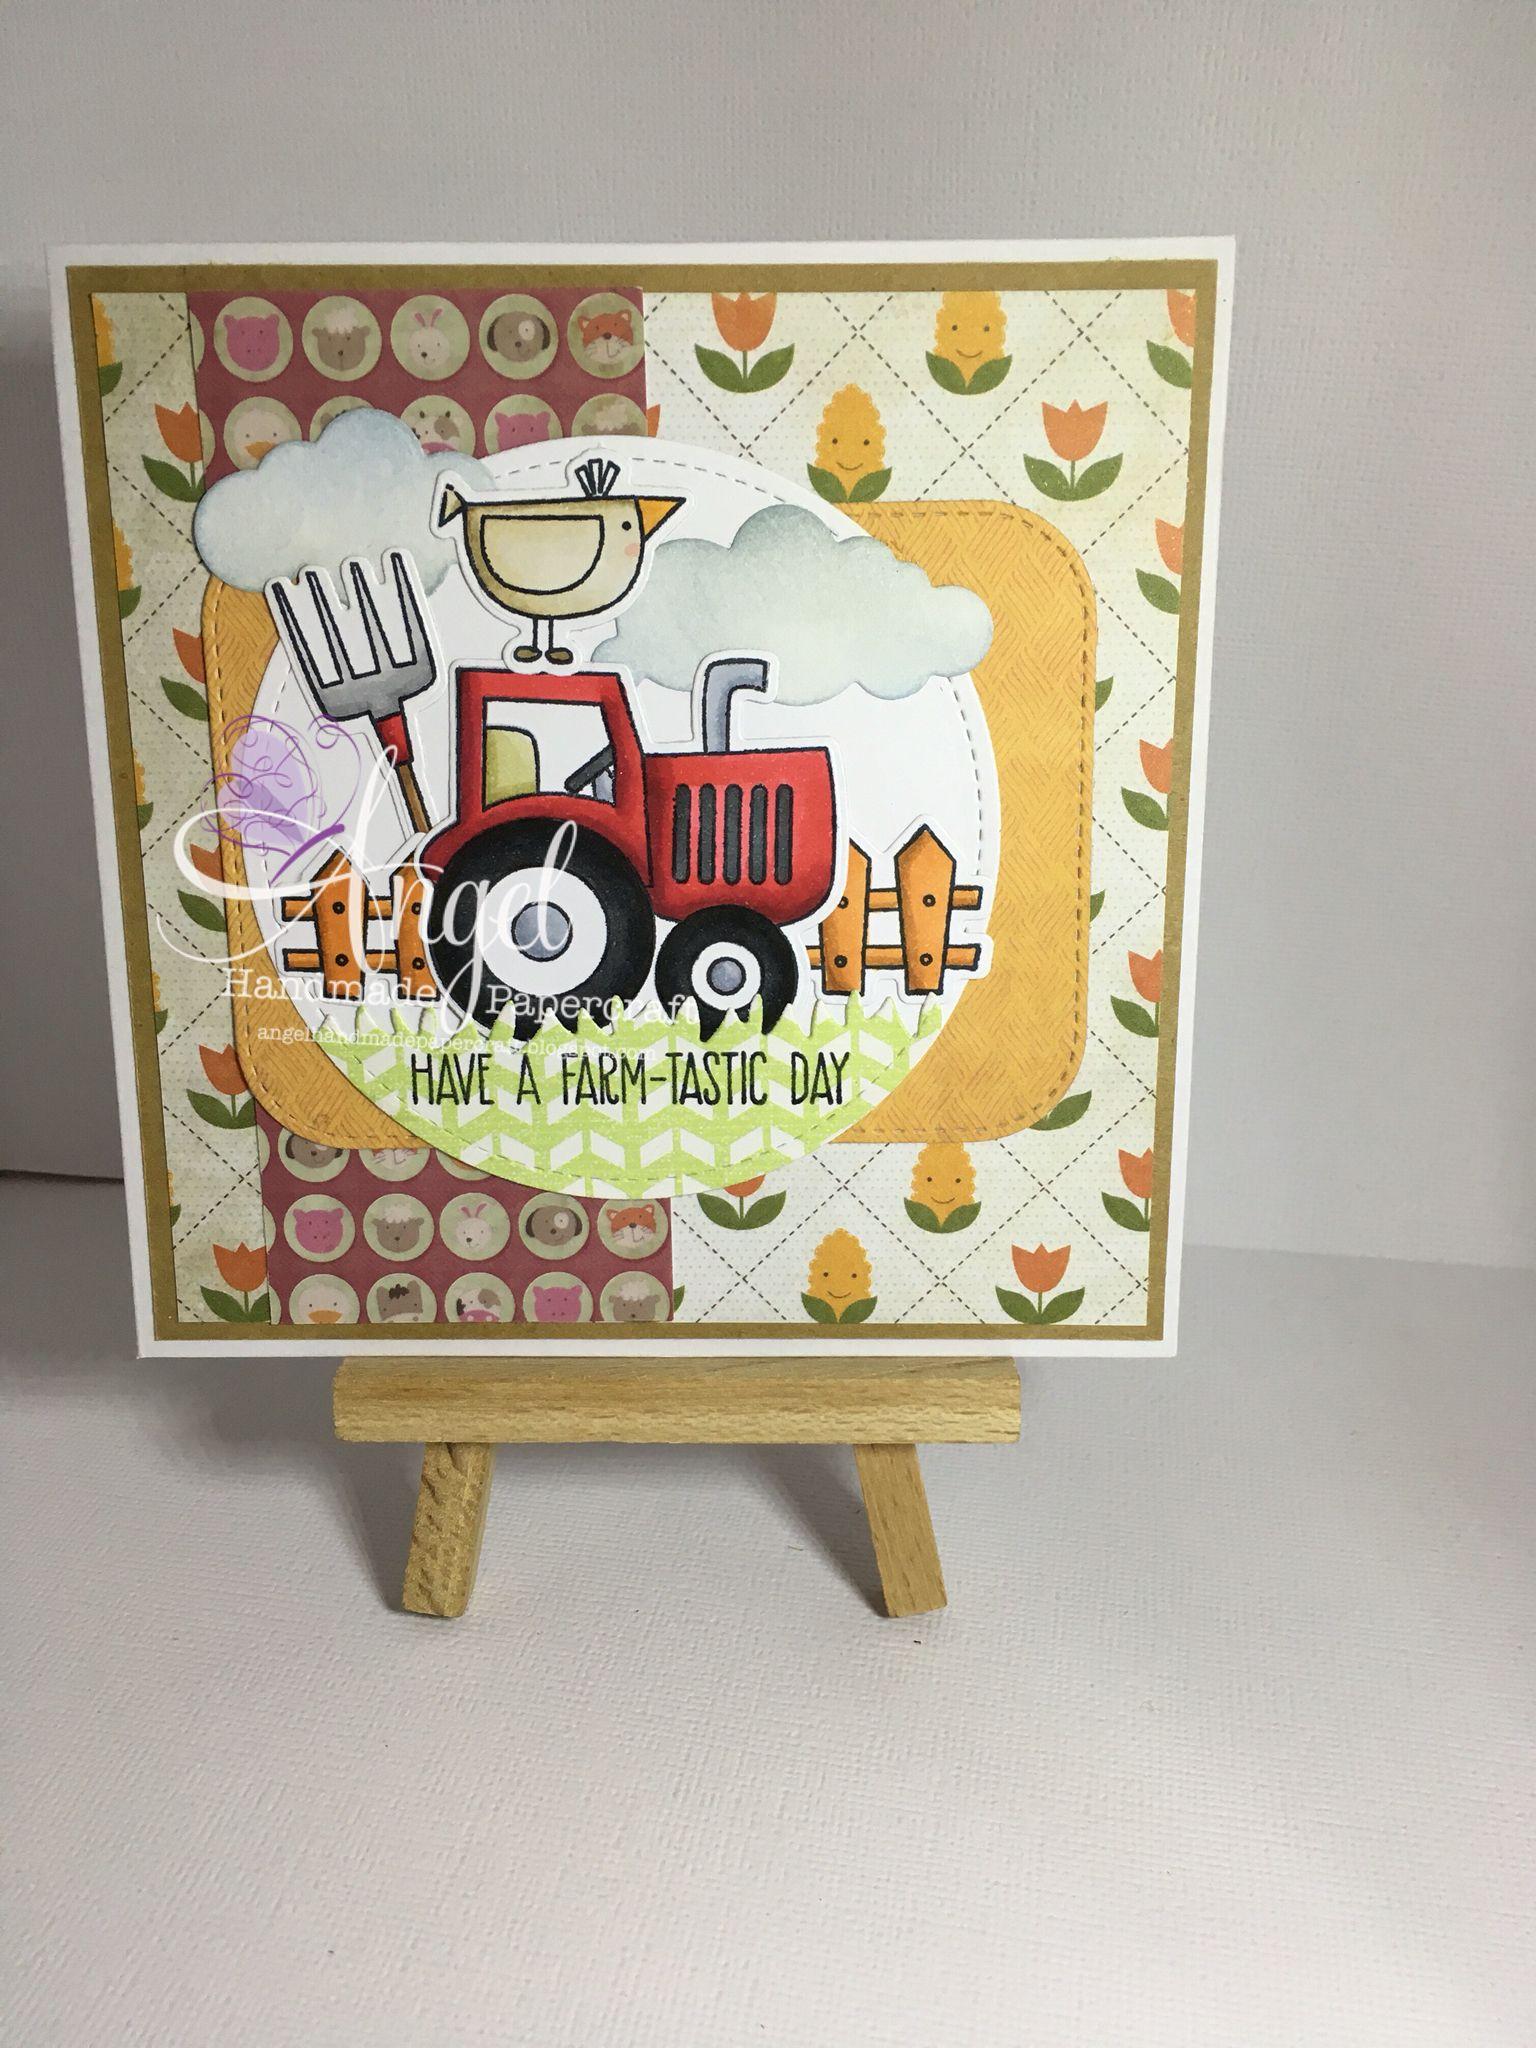 Mft farm-tastic  Card created by Angel Handmade Papercraft